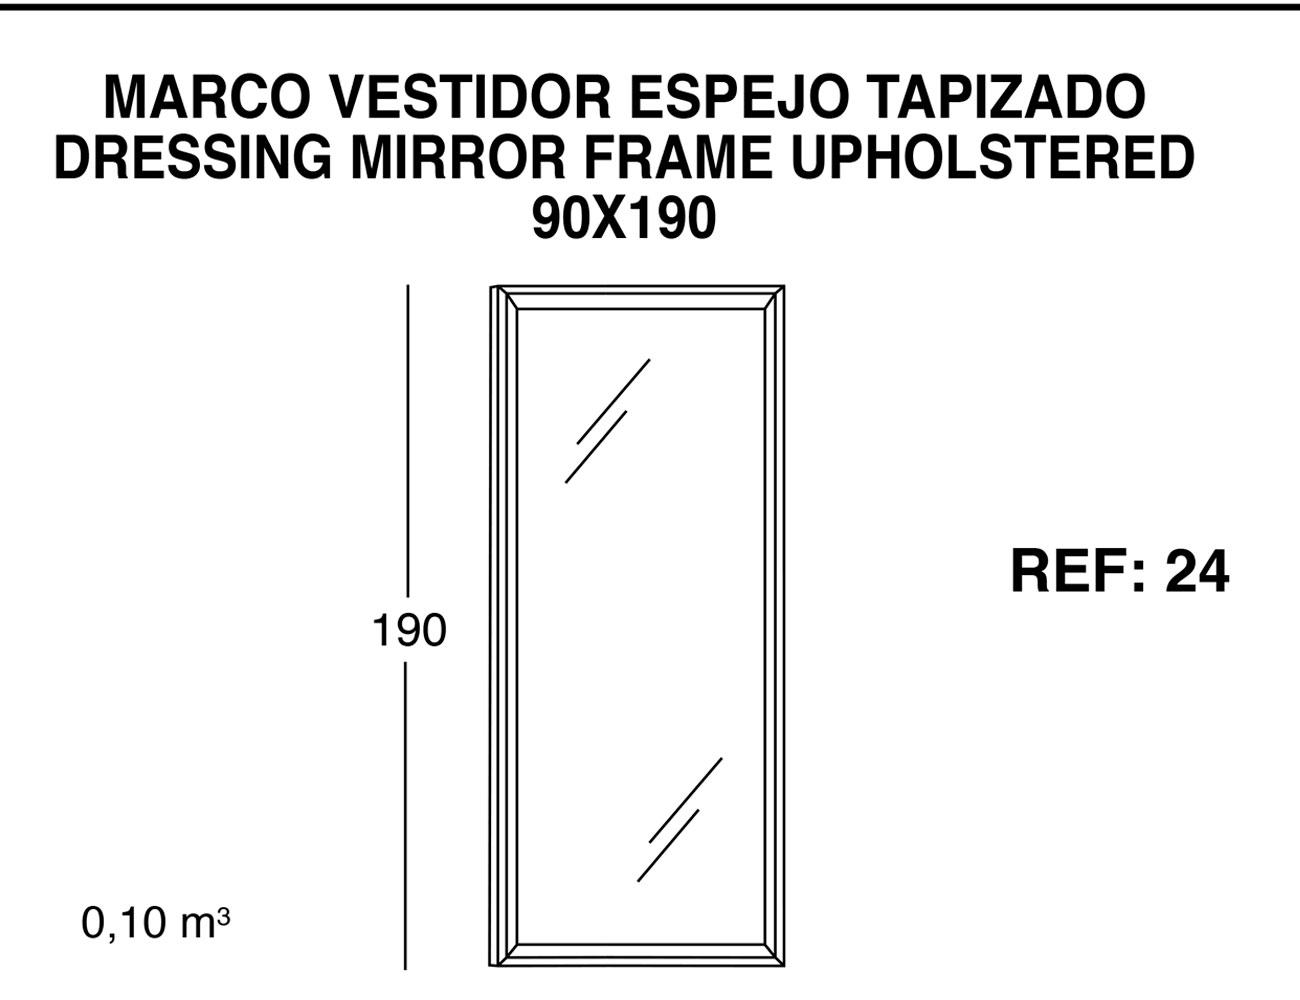 Marco vestidor espejo tapizado1